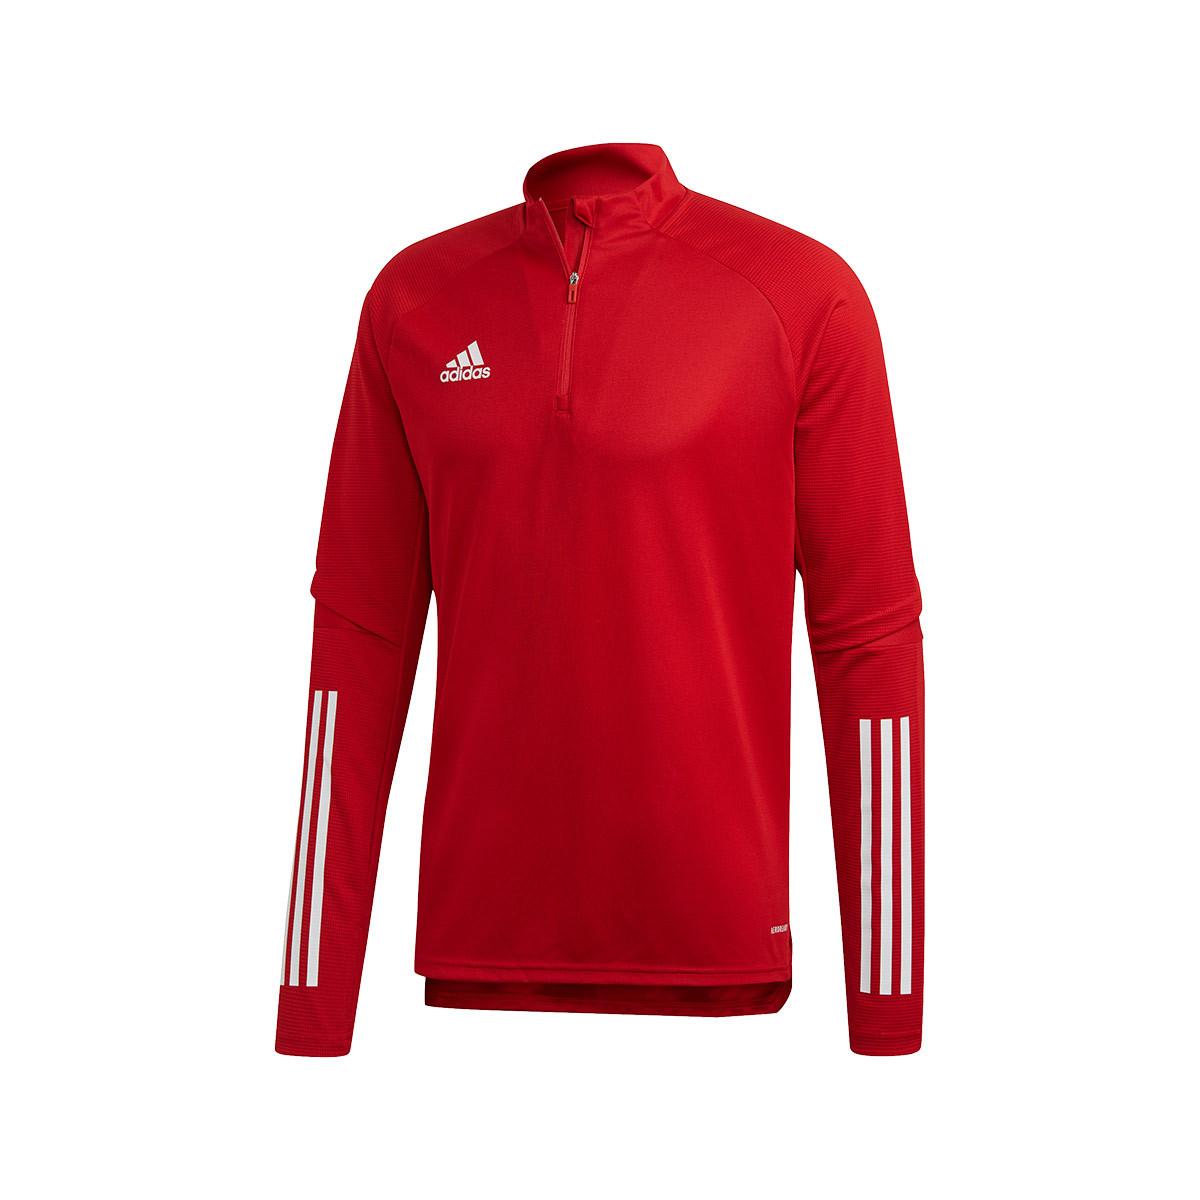 Sweatshirt Adidas Condivo 20 Training Power Red Futbol Emotion [ 1200 x 1200 Pixel ]